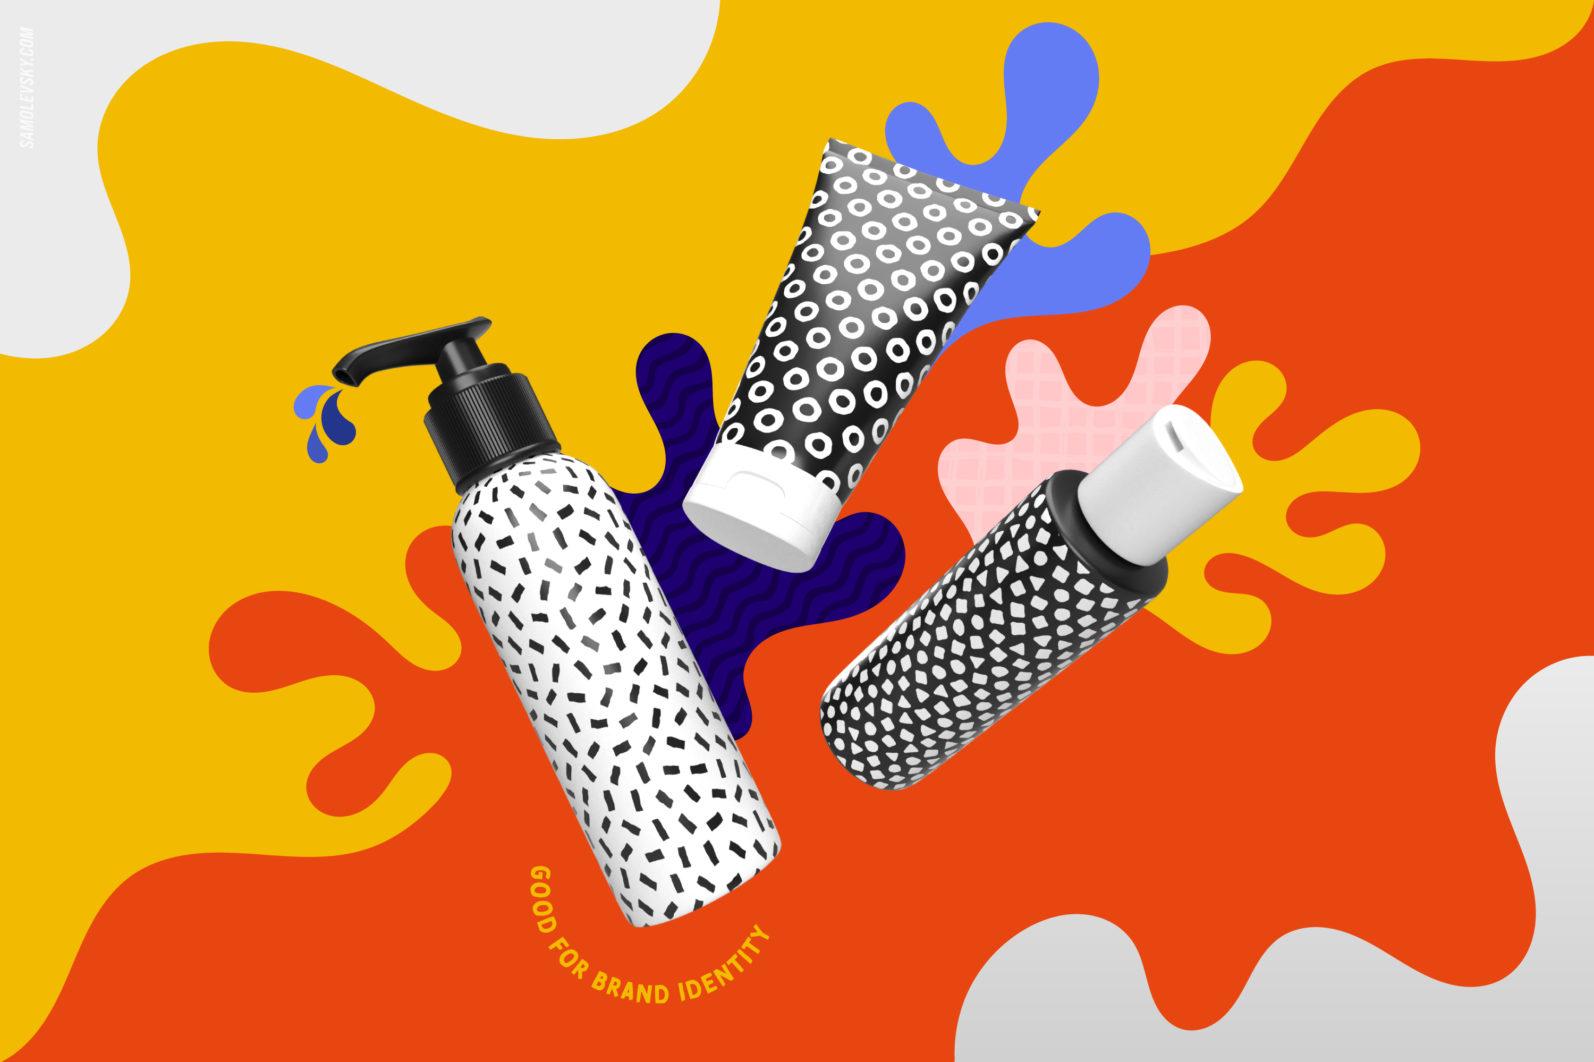 Handmade patterns bundle - 300 seamless patterns, brushes, and shapes - Samolevsky.com Handmade patterns bundle 17 scaled -